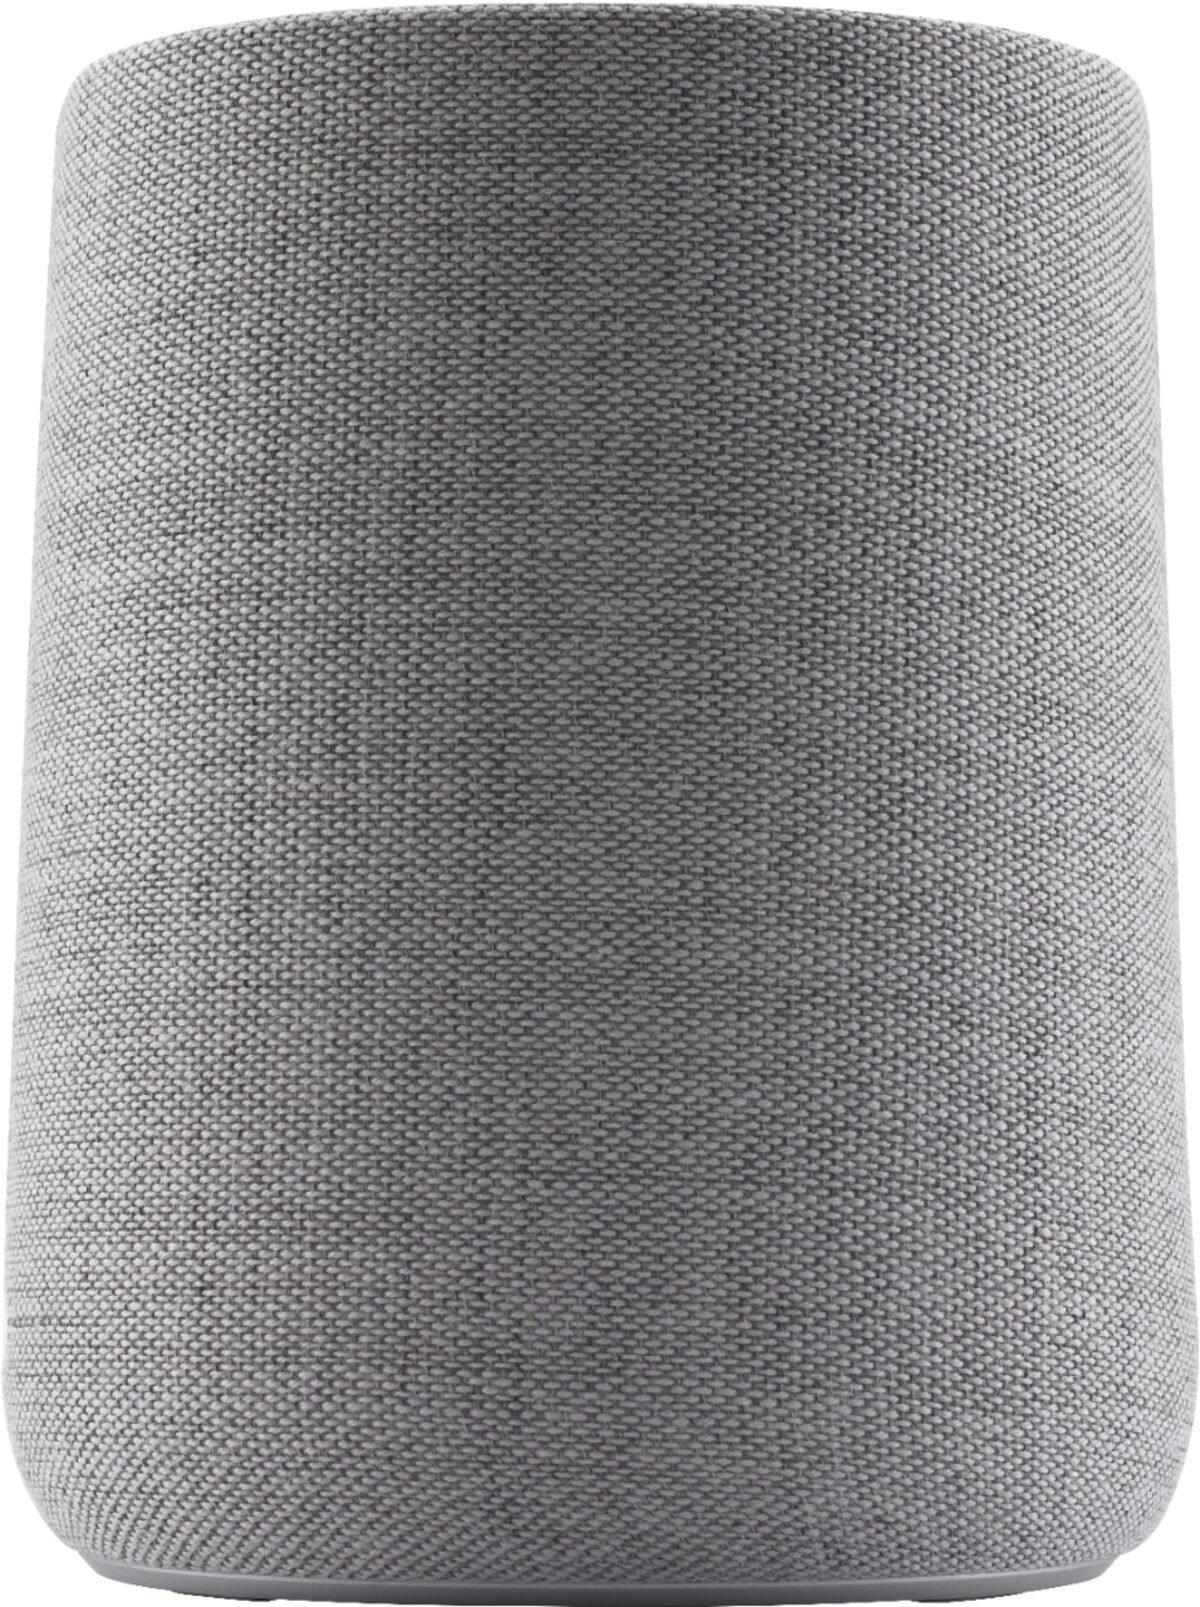 Harman Kardon Citation ONE Smart Speaker w/ Google Assistant (Gray)